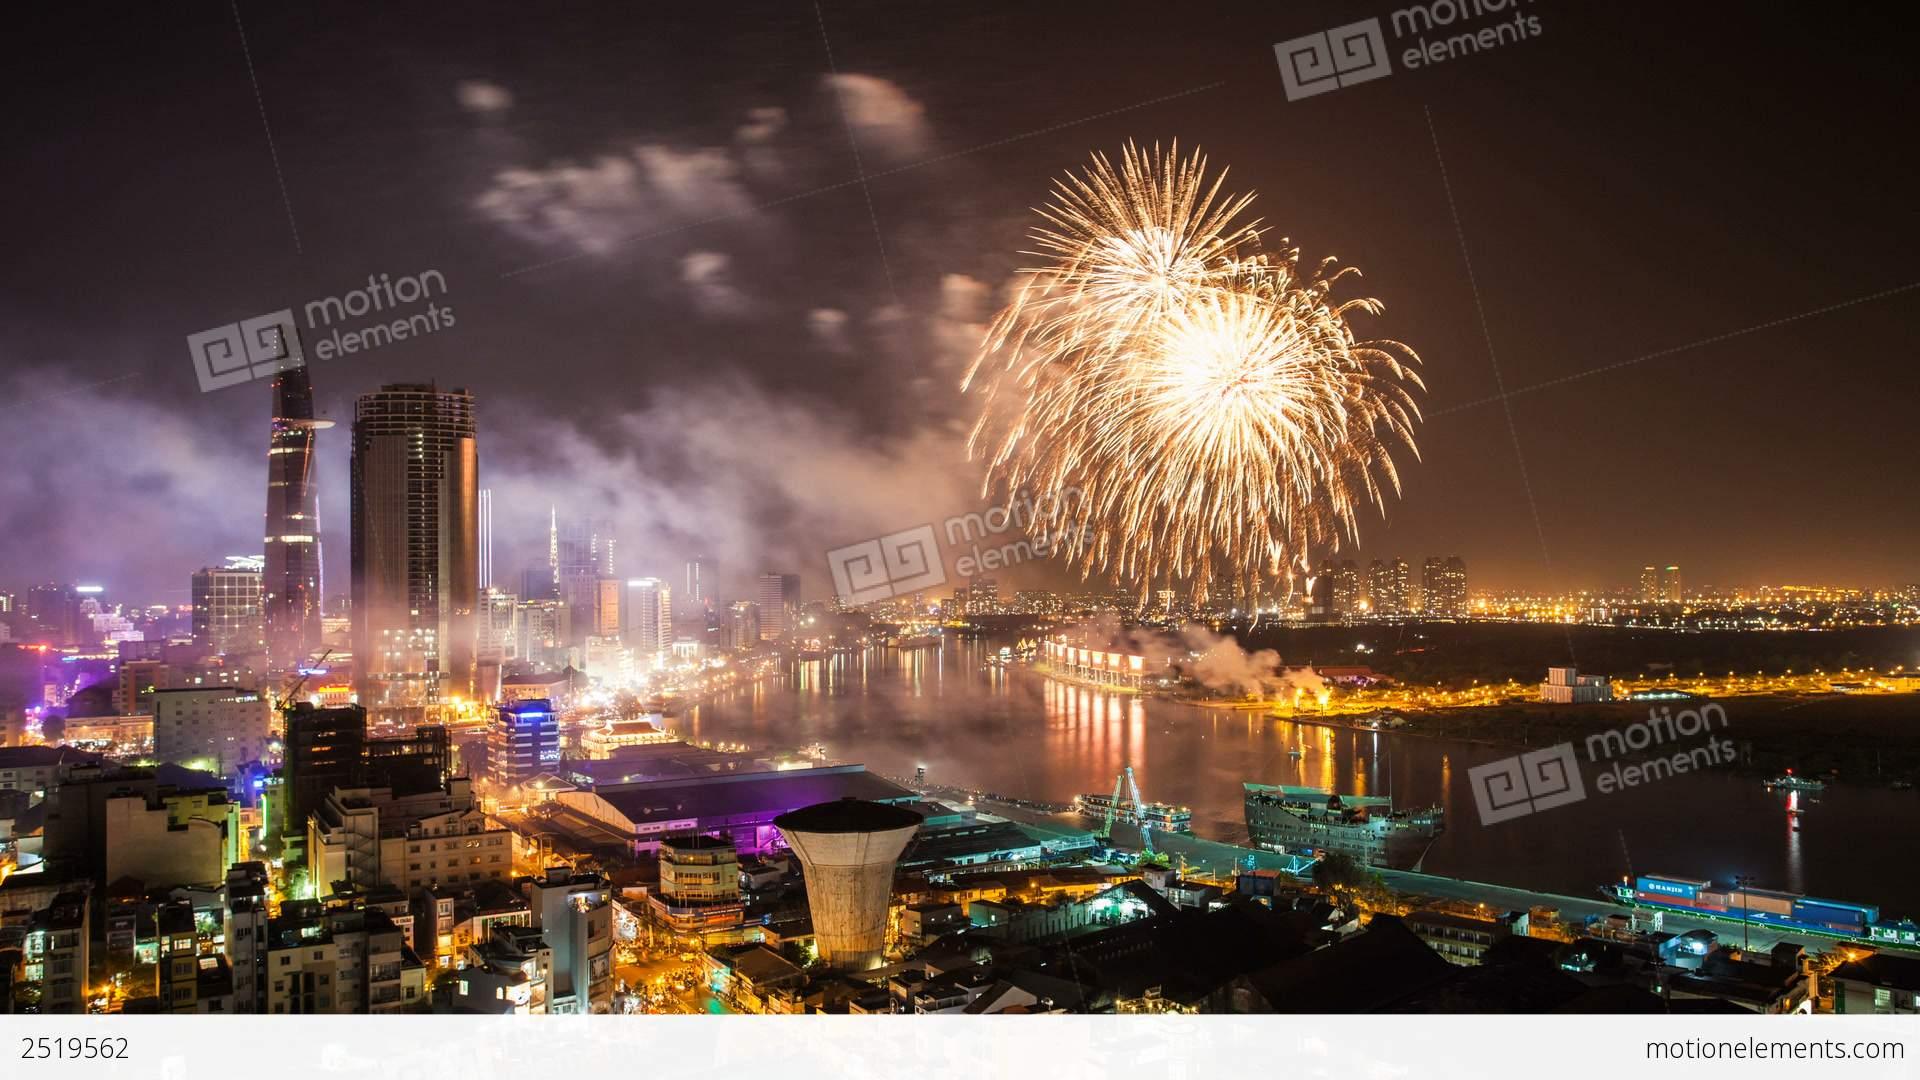 1080 - TET - CHINESE NEW YEAR FIREWORKS - HO CHI M 影片素材 ...